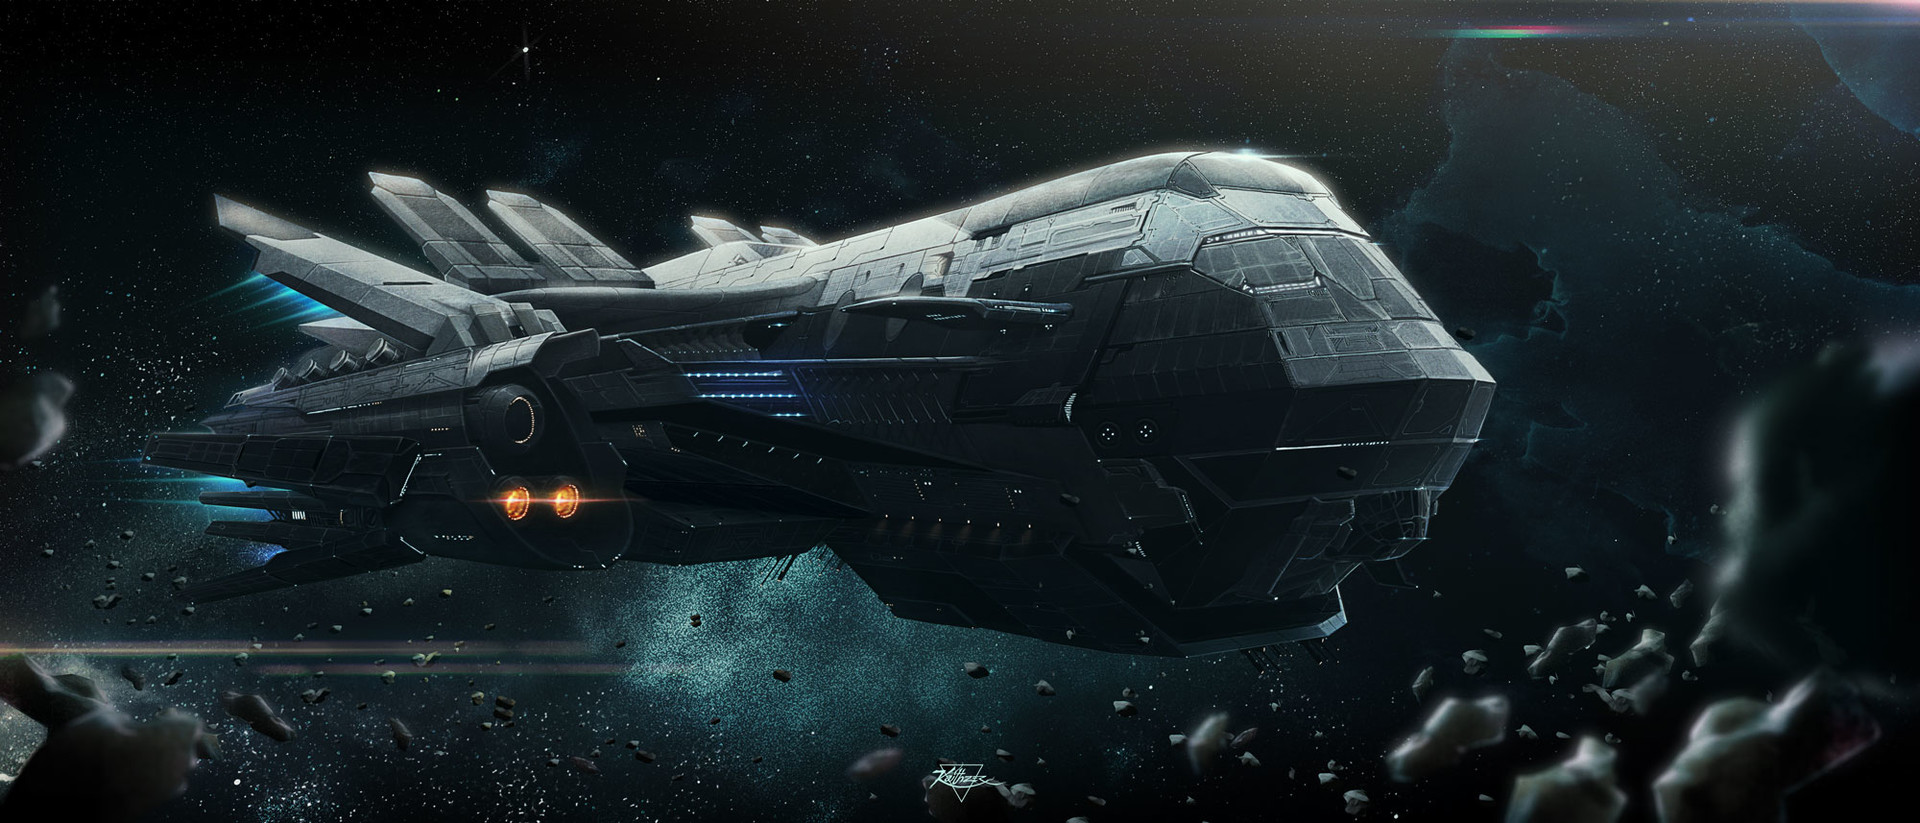 Kaithzer morejon nave espacio 2